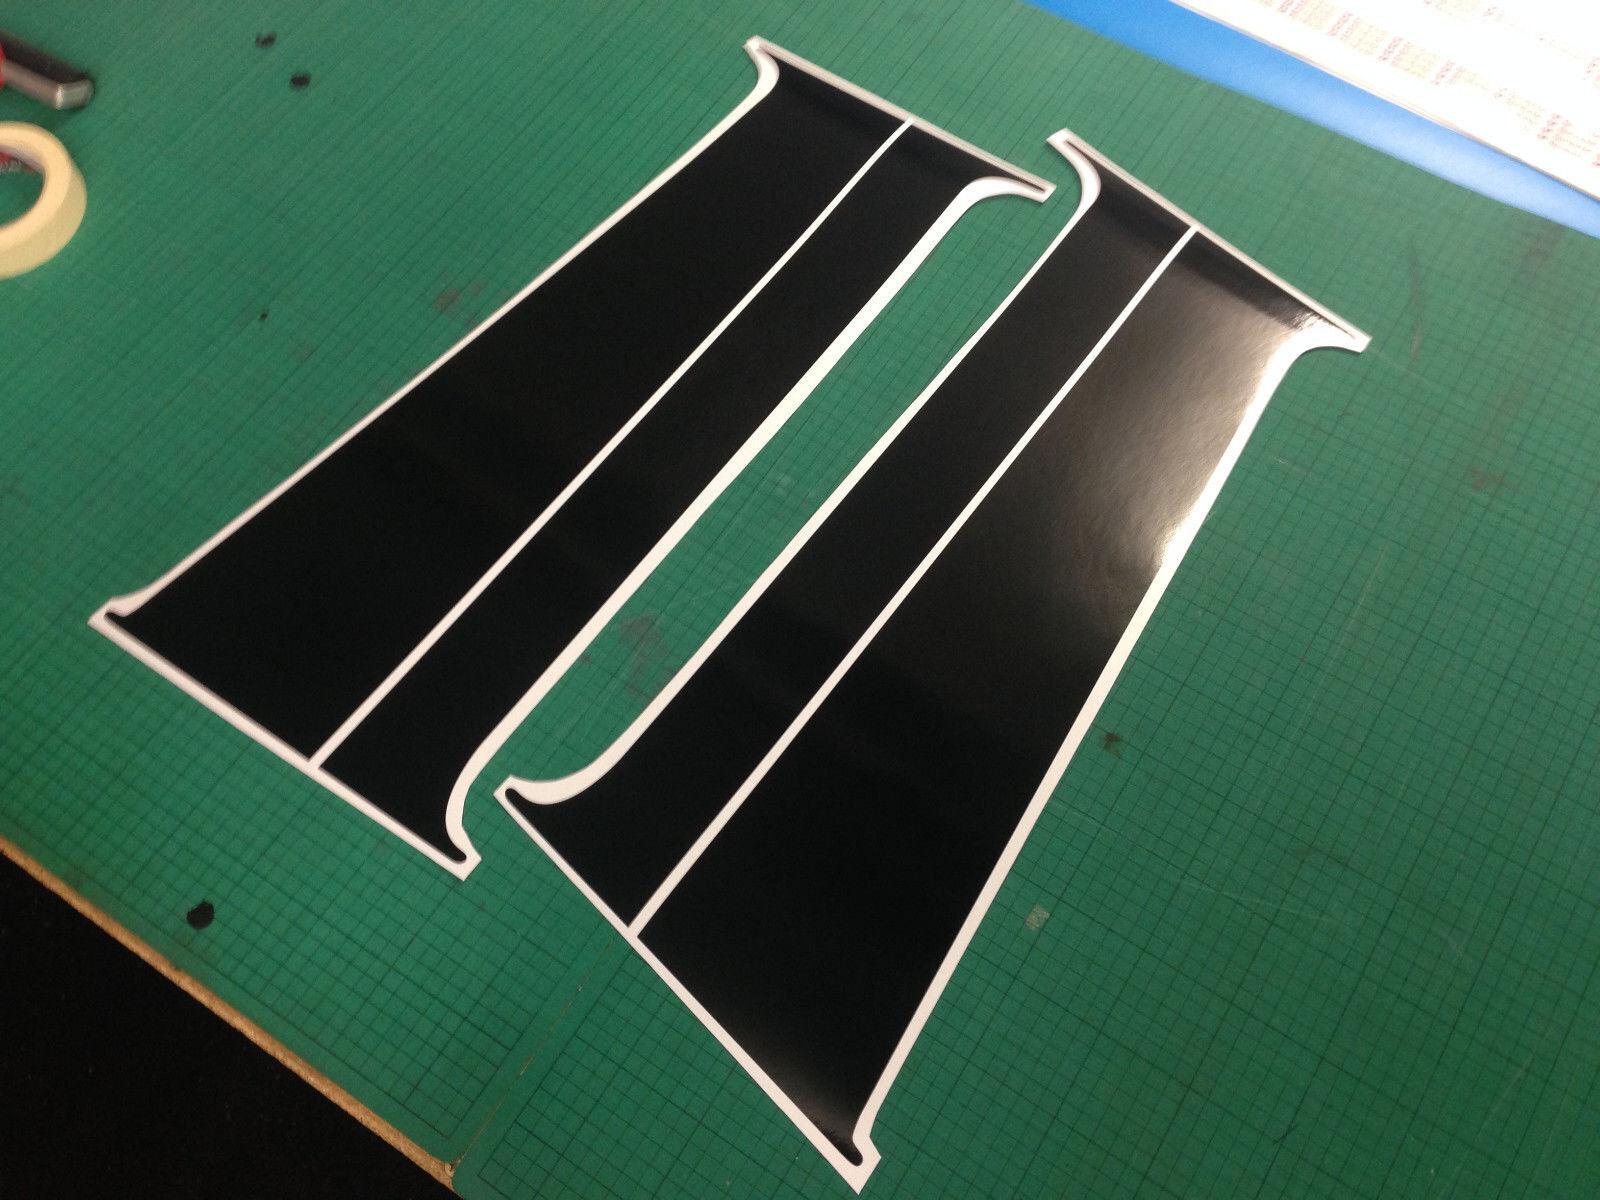 Car Parts - VW T5/T6 Transporter B Pillar Decal Sticker Gloss Black Vinyl *NEW*